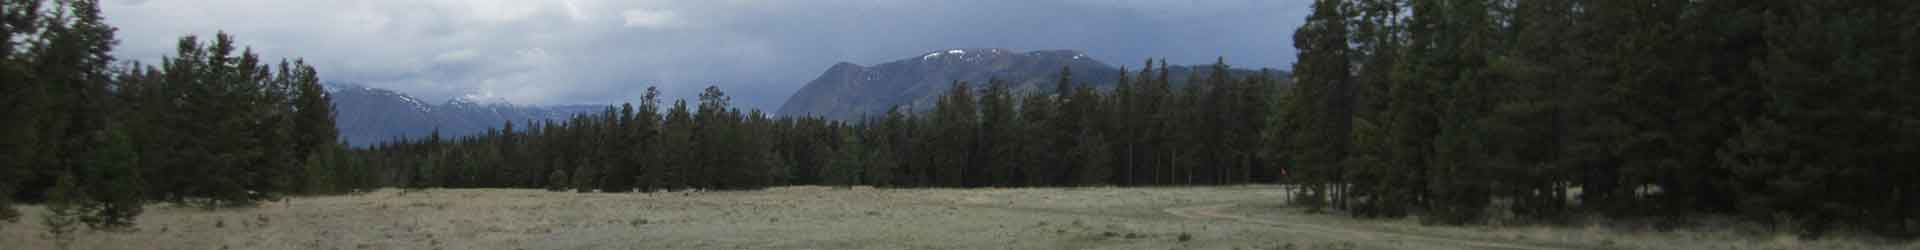 Mt. Lorne, Yukon